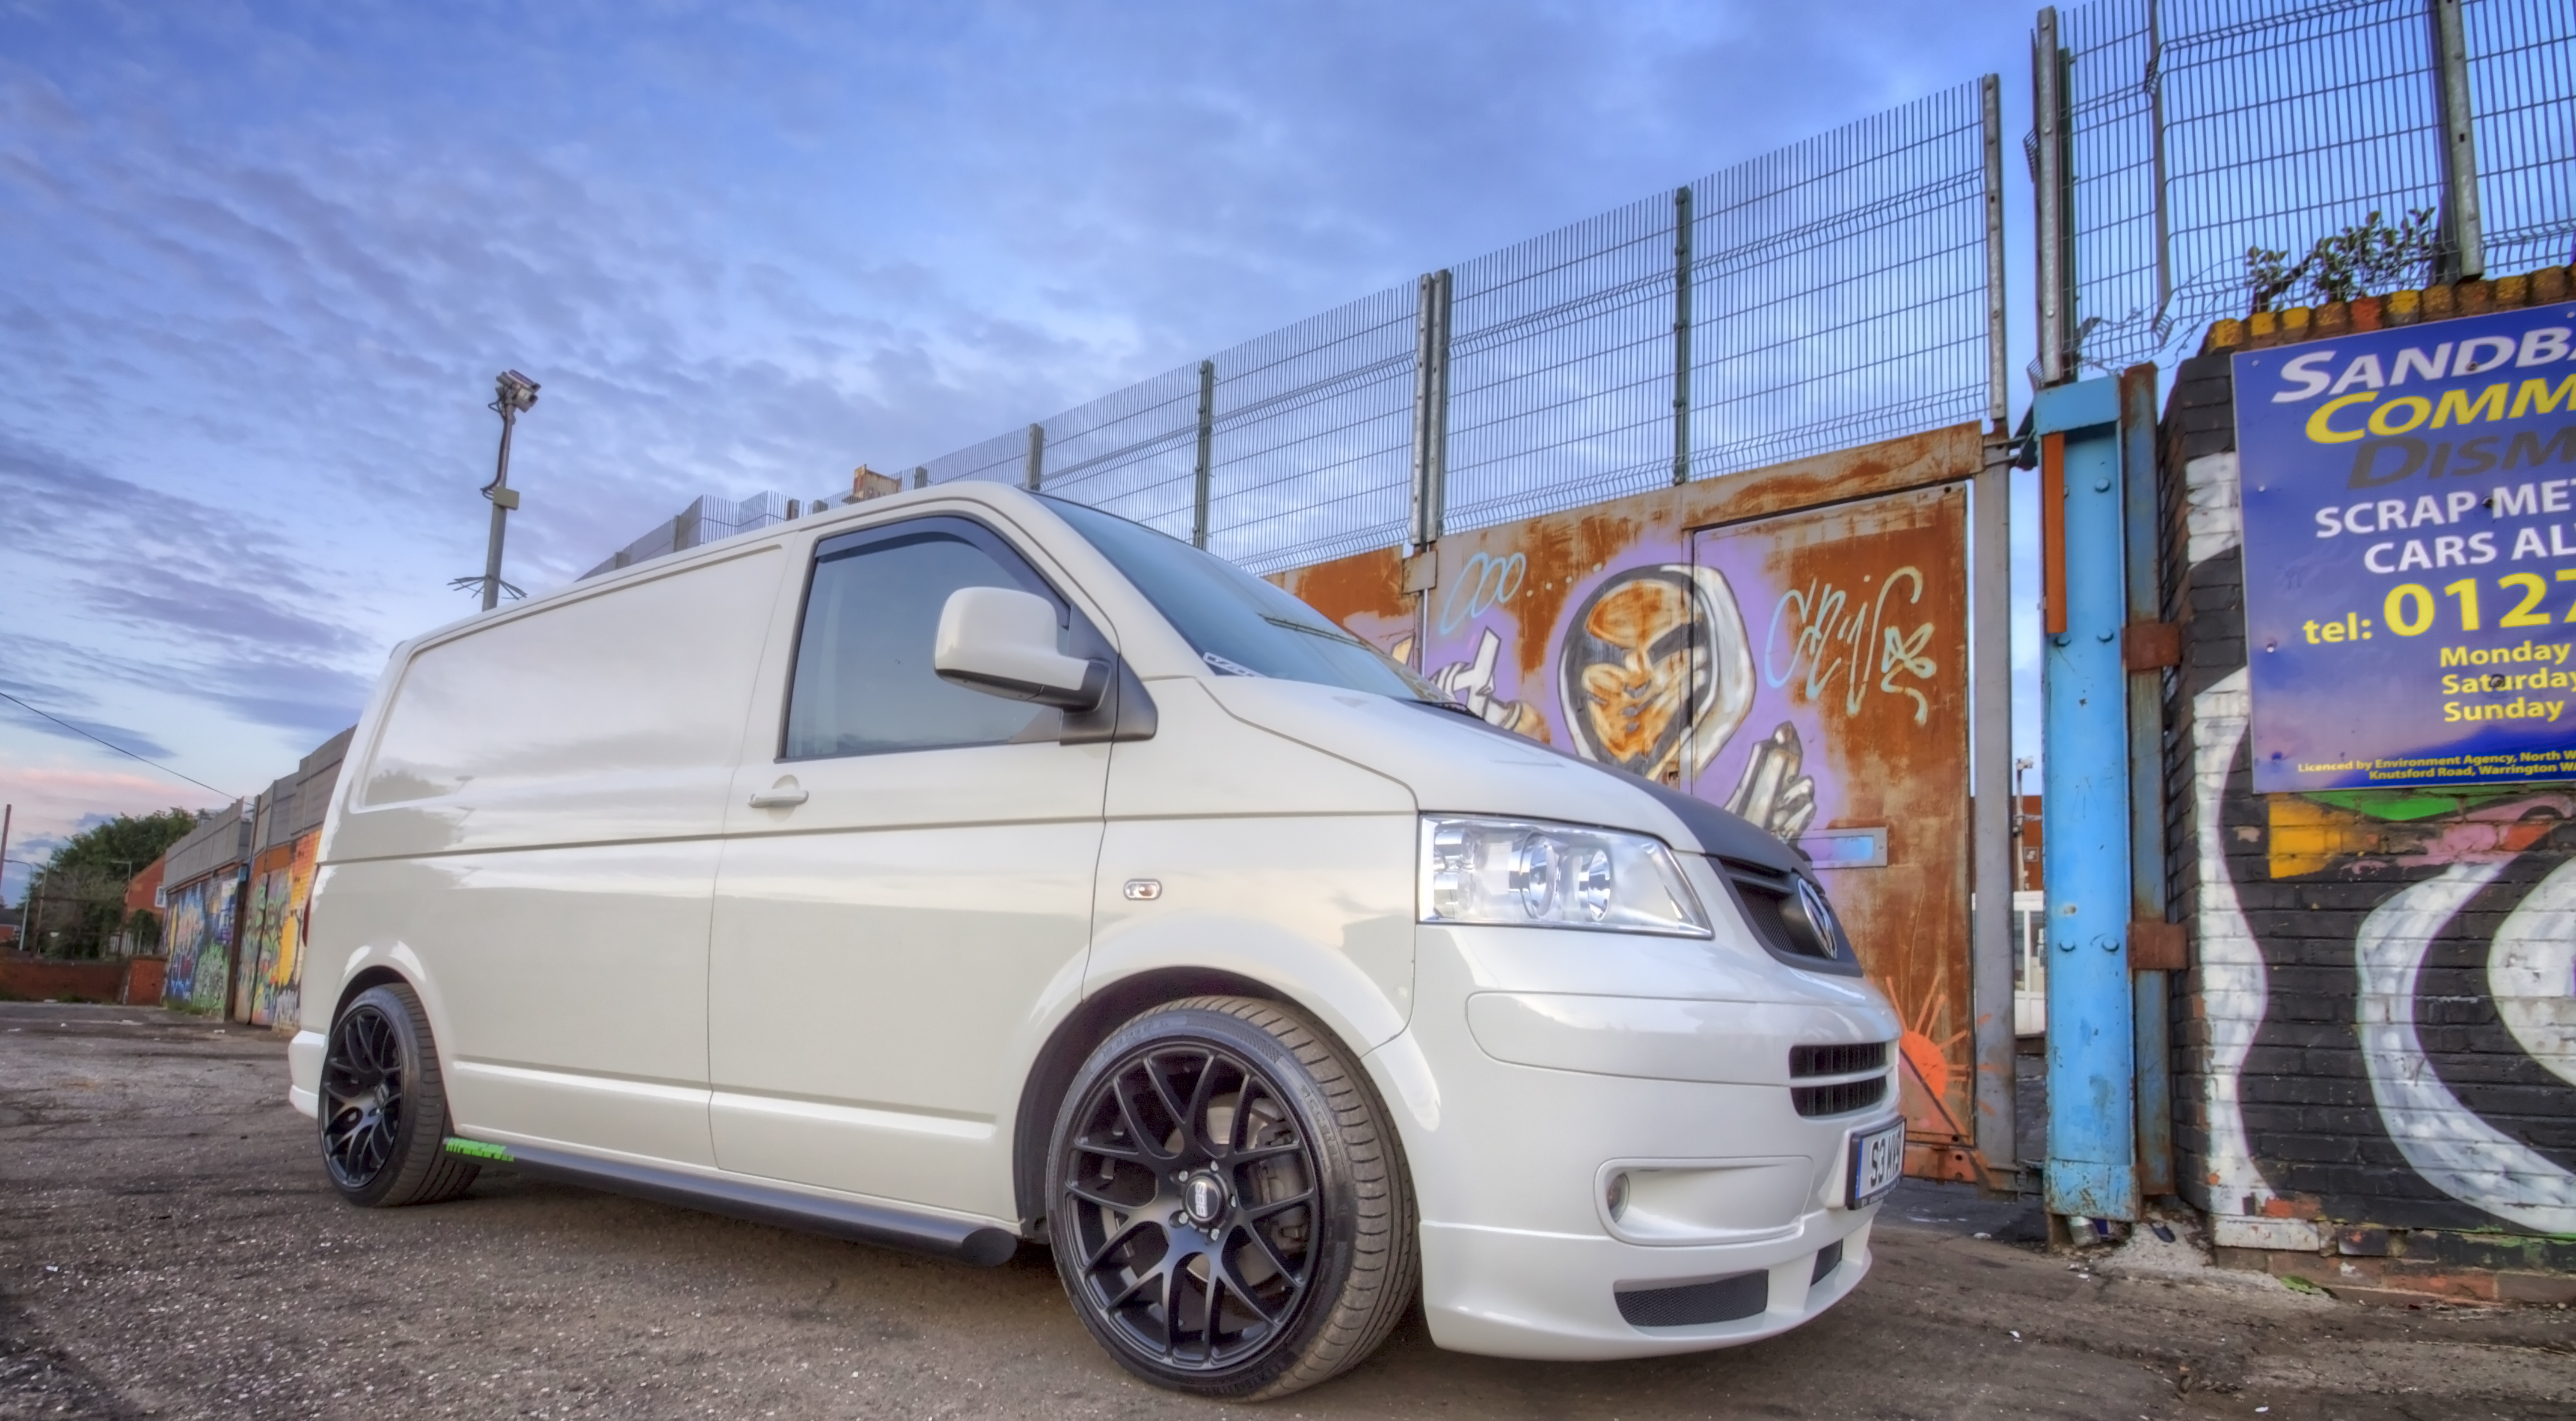 dpf removal for t5 t5 1 vw transporters diesel. Black Bedroom Furniture Sets. Home Design Ideas